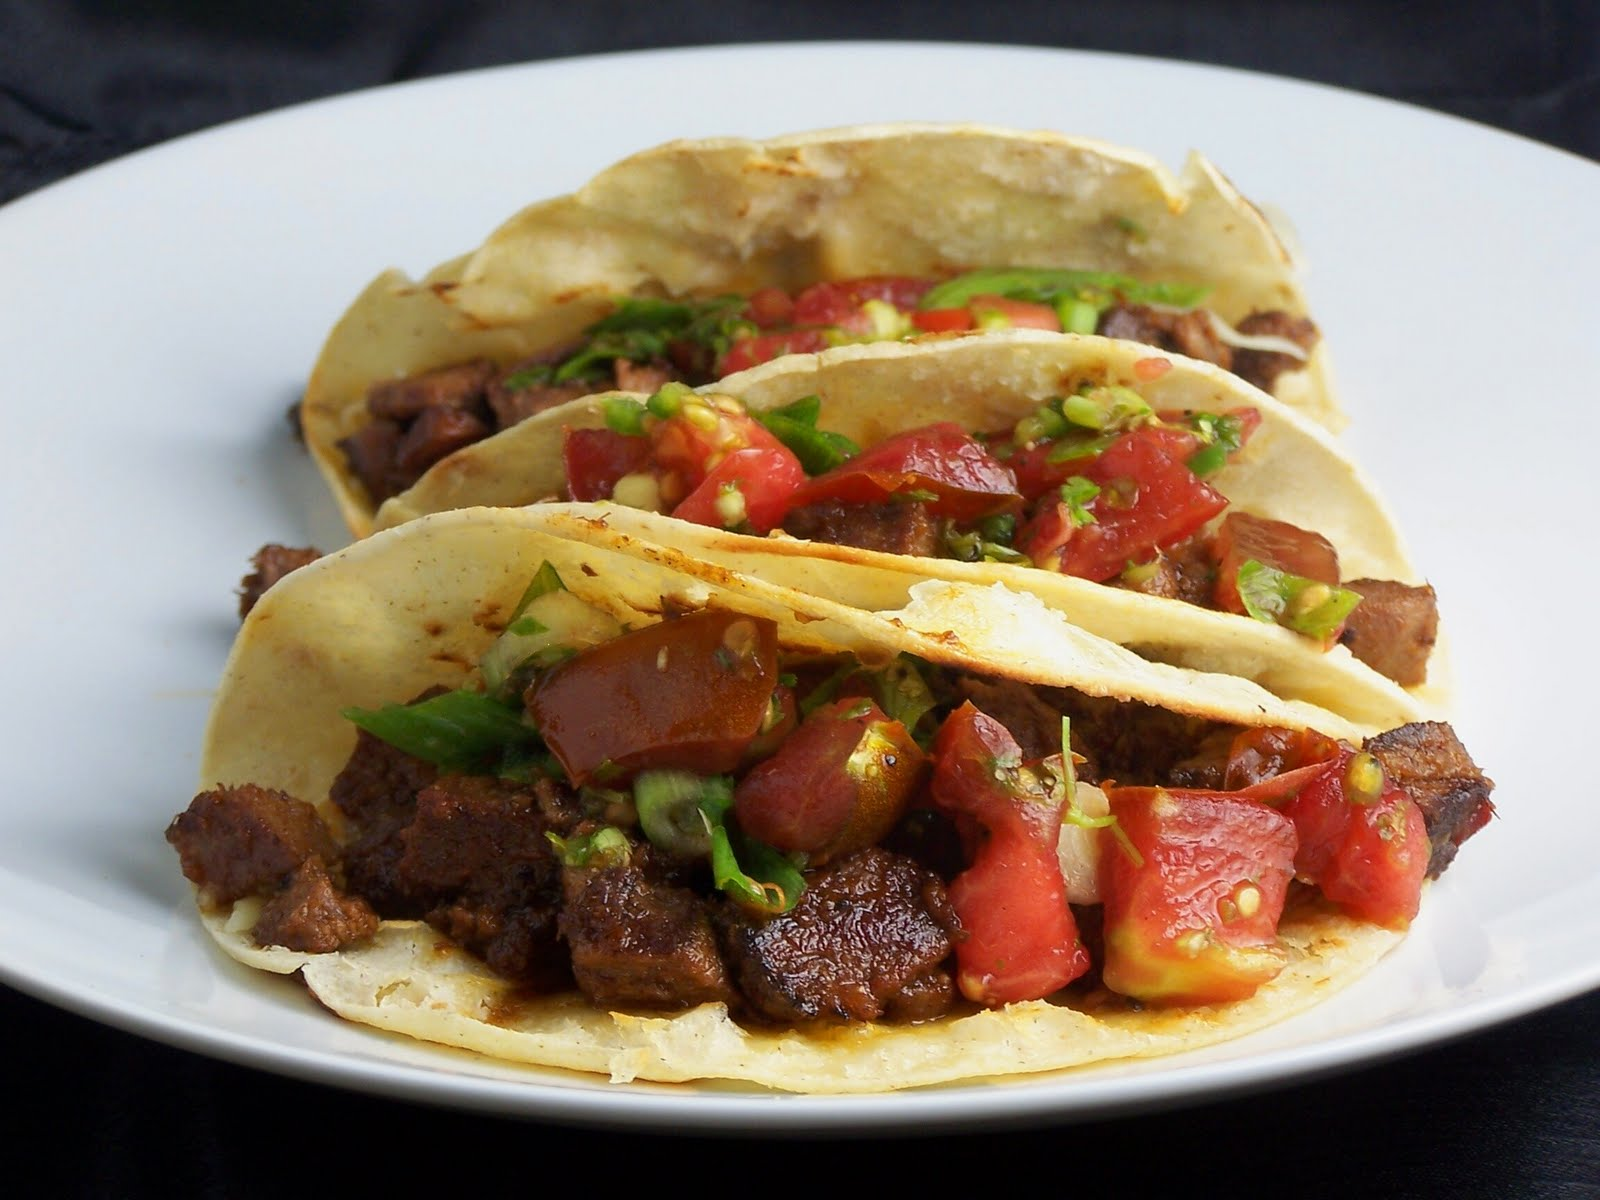 Tacos de Lengua (Braised Beef Tongue Tacos)